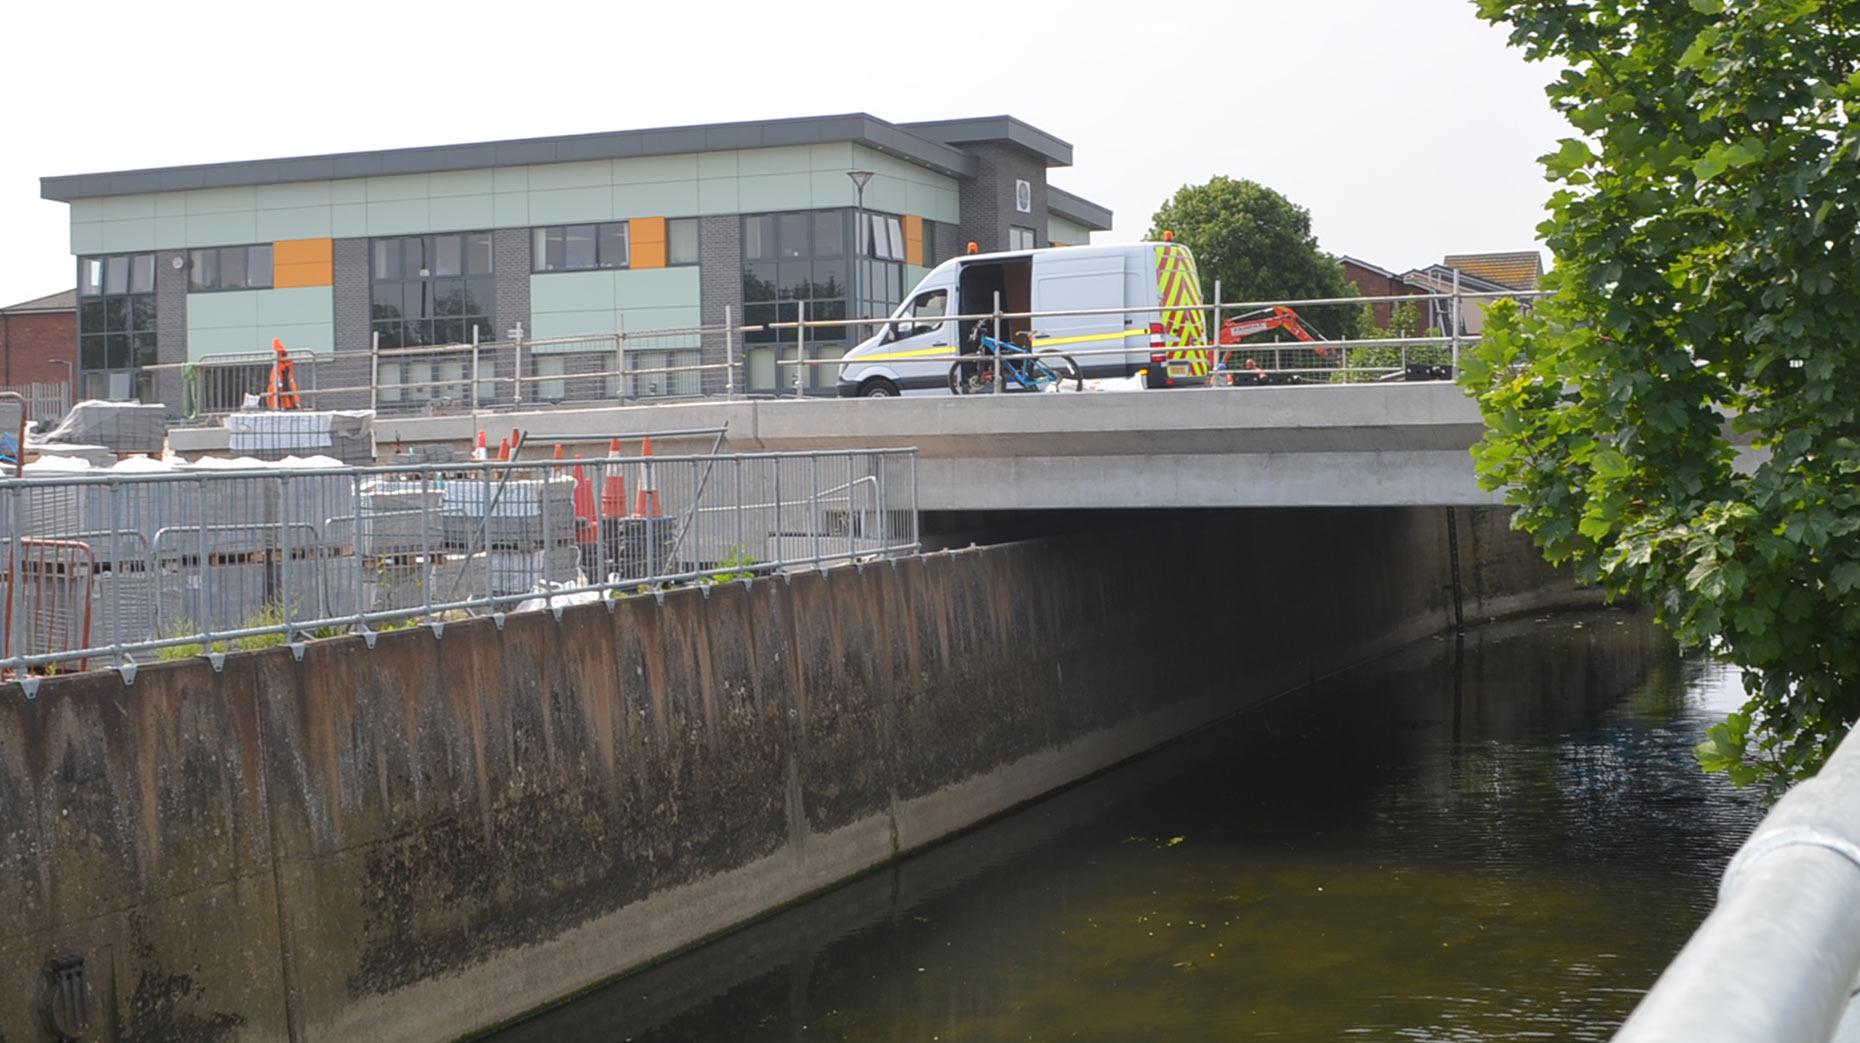 The road bridge will open on June 13.